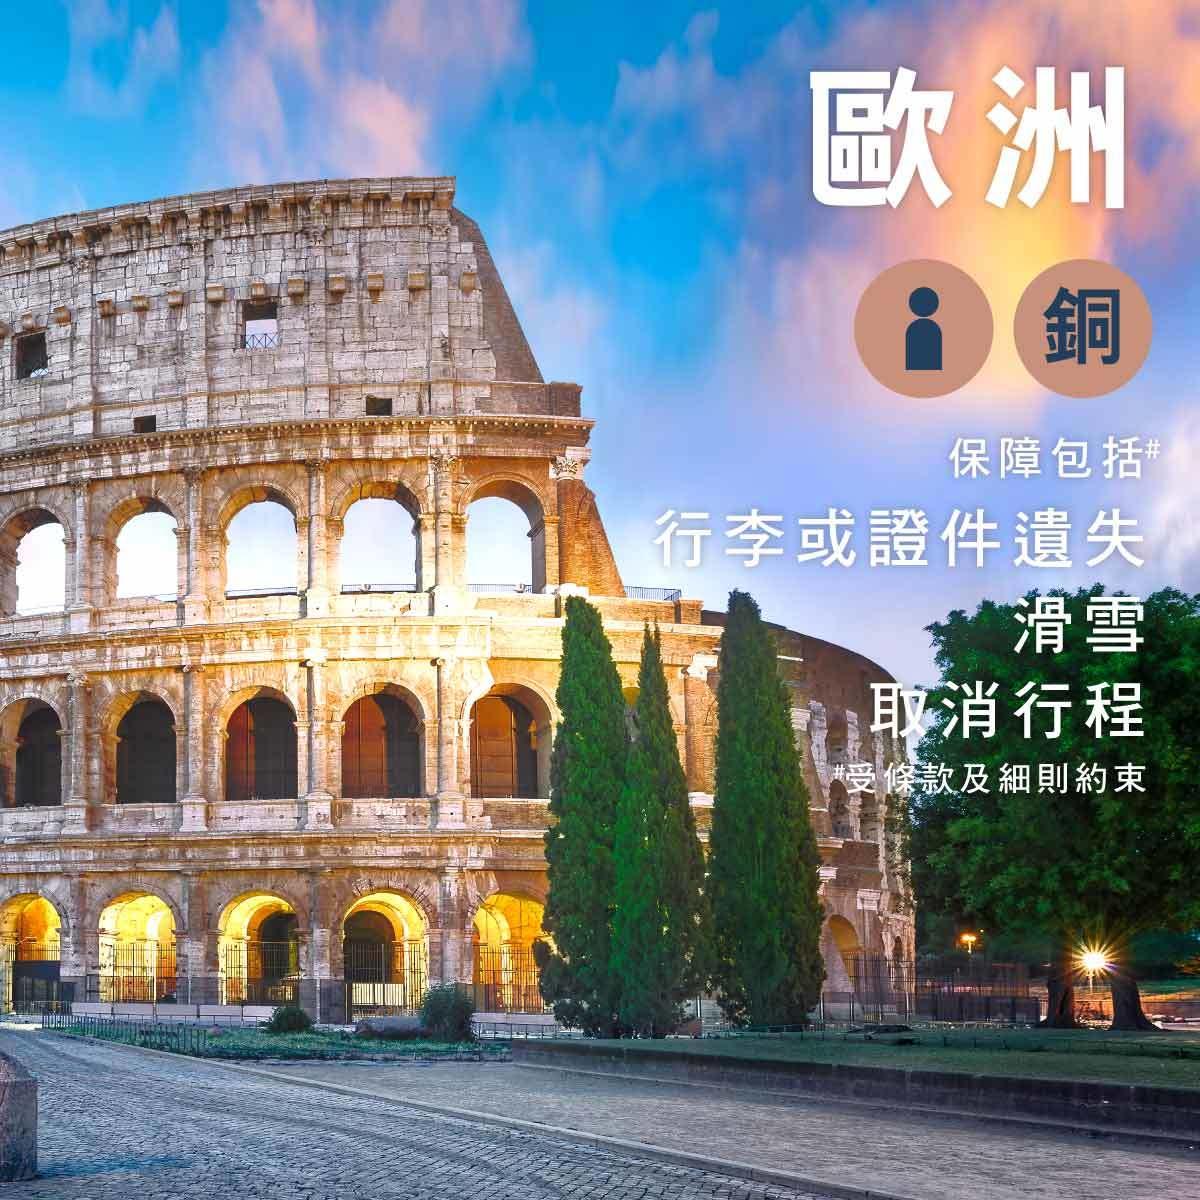 Europe - Single Trip Individual Travel Insurance